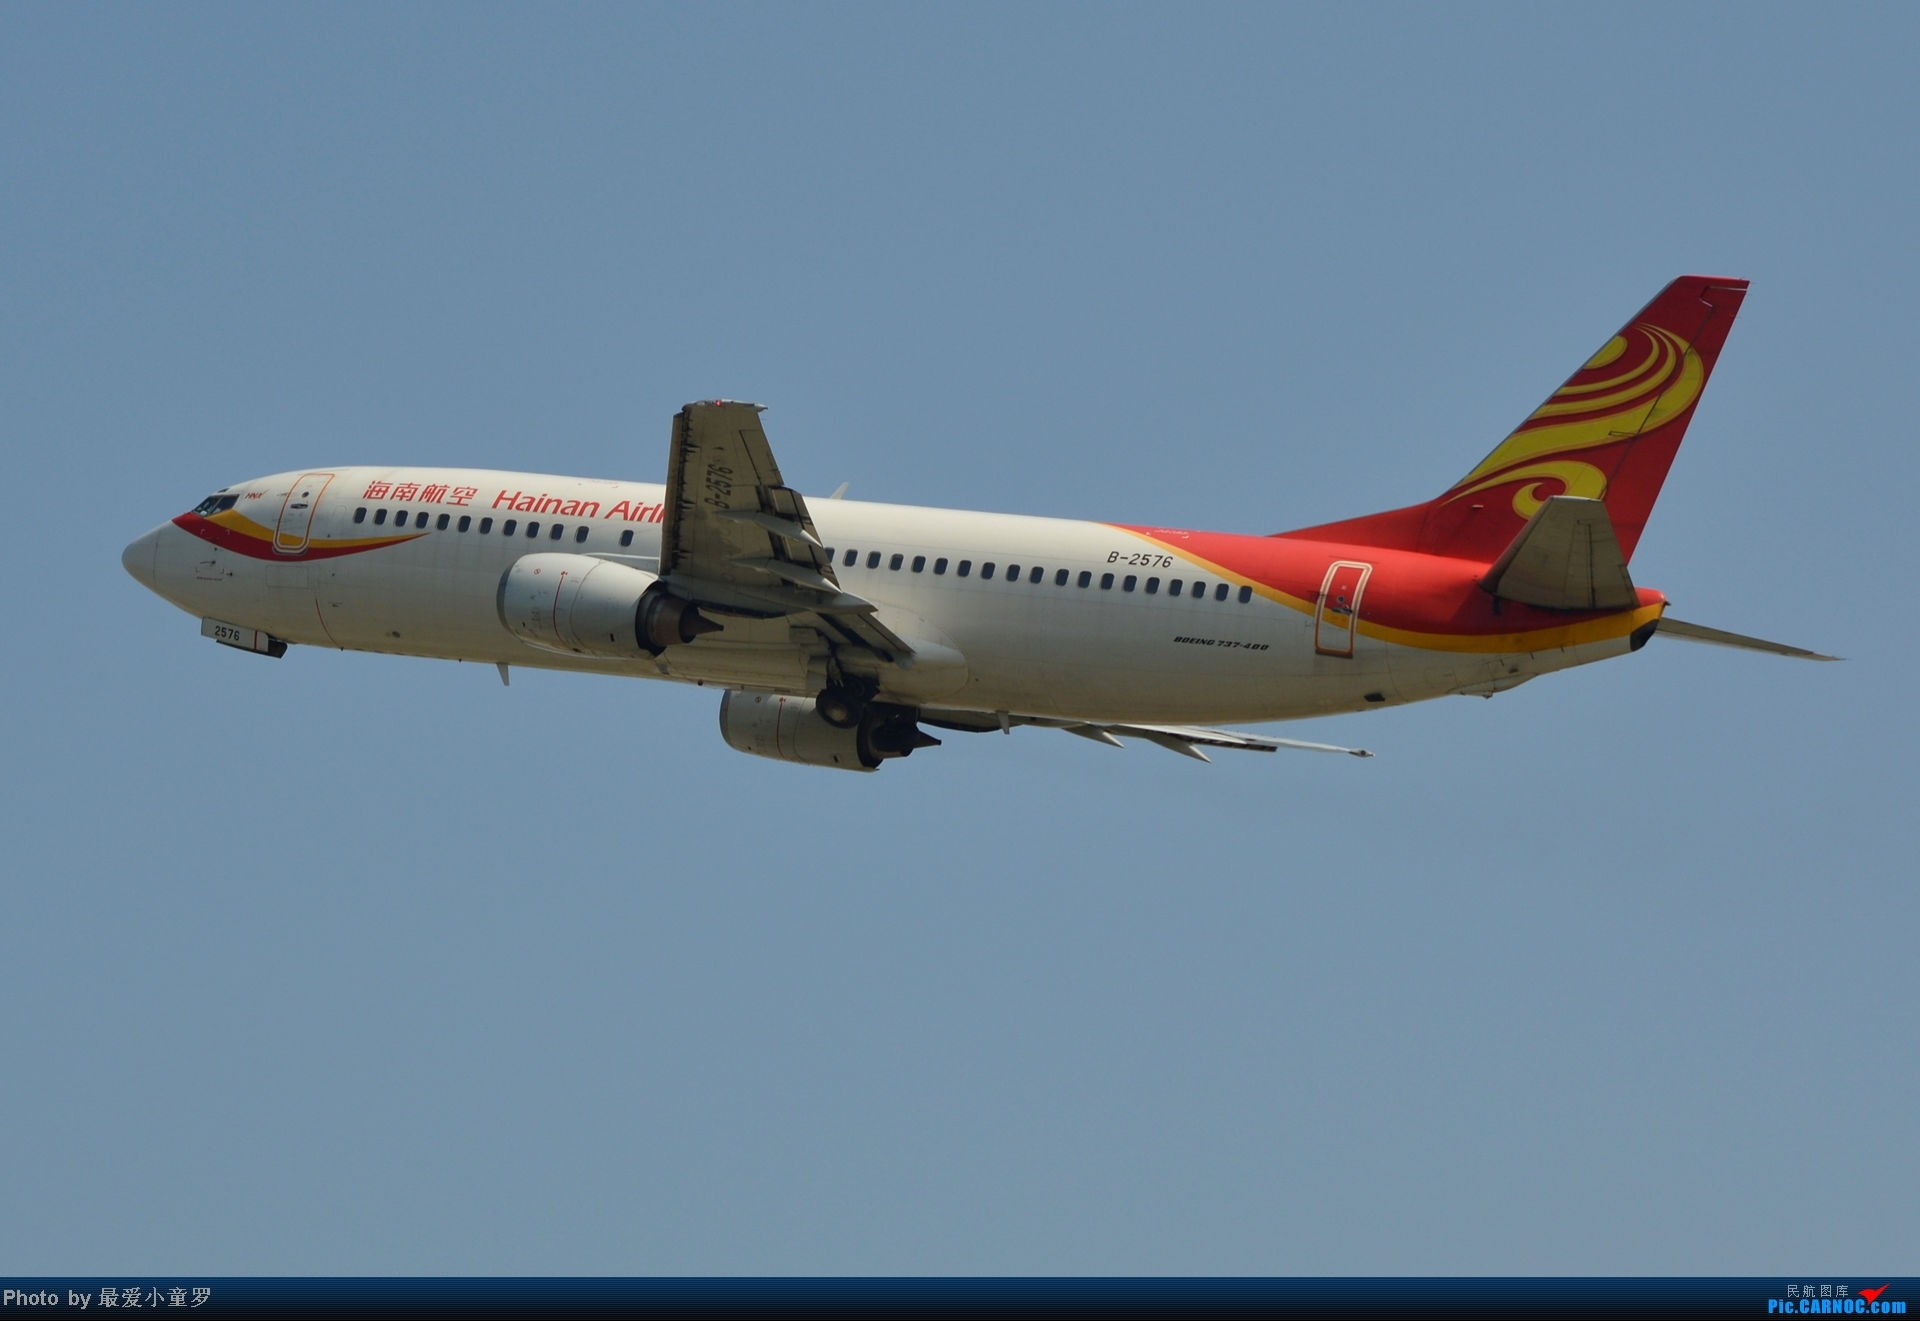 Re:[原创]老图系列,13年11月15日广州白云机场西跑拍机 BOEING 737-400 B-2576 中国广州白云机场